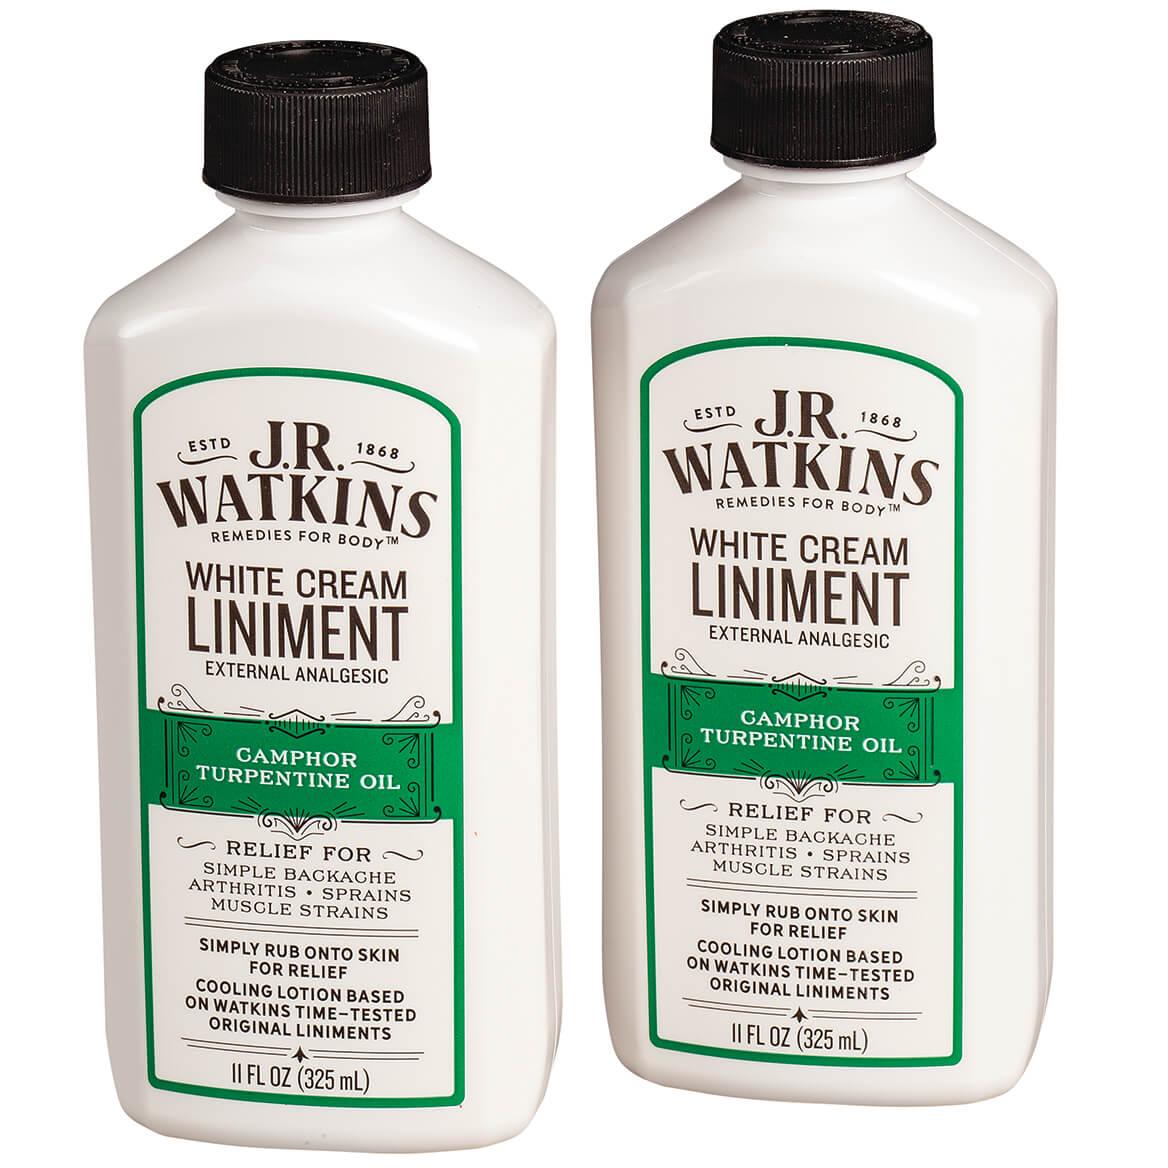 Watkins® White Cream Liniment 11 oz., Set of 2-371672